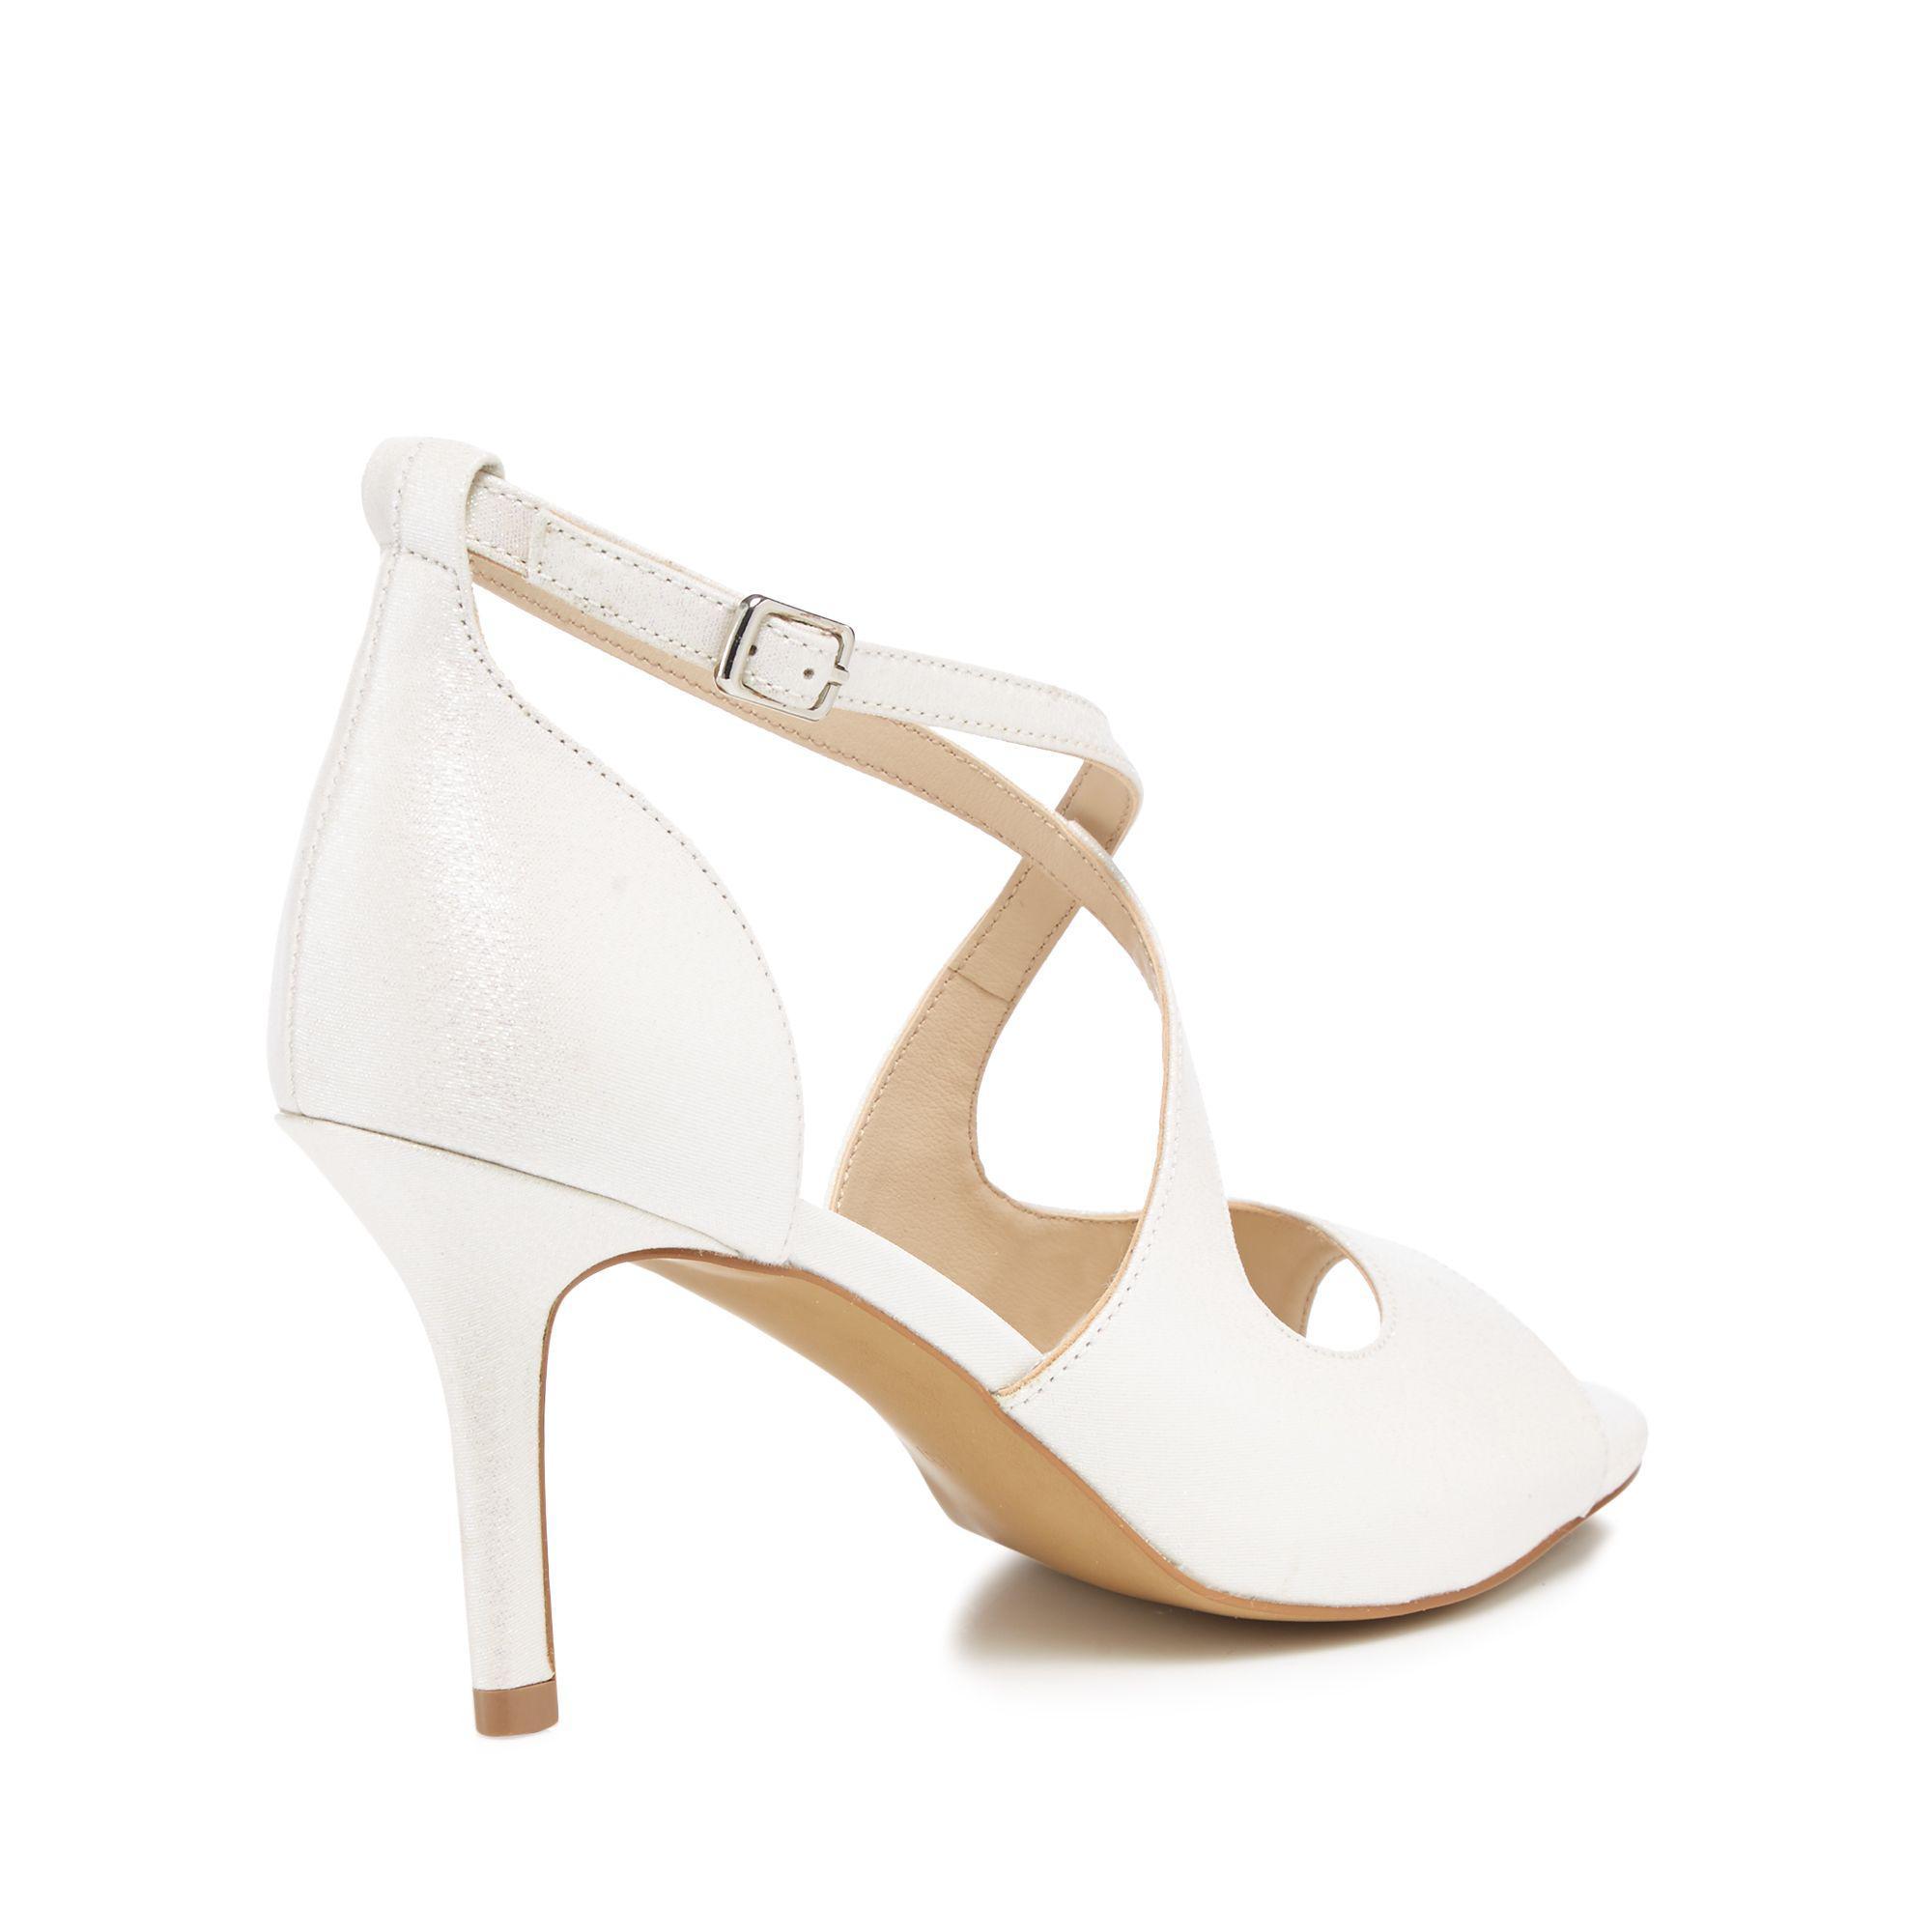 Ivory 'Deja' high stiletto heel peep toe sandals cheap sale big discount CqBKc29y1